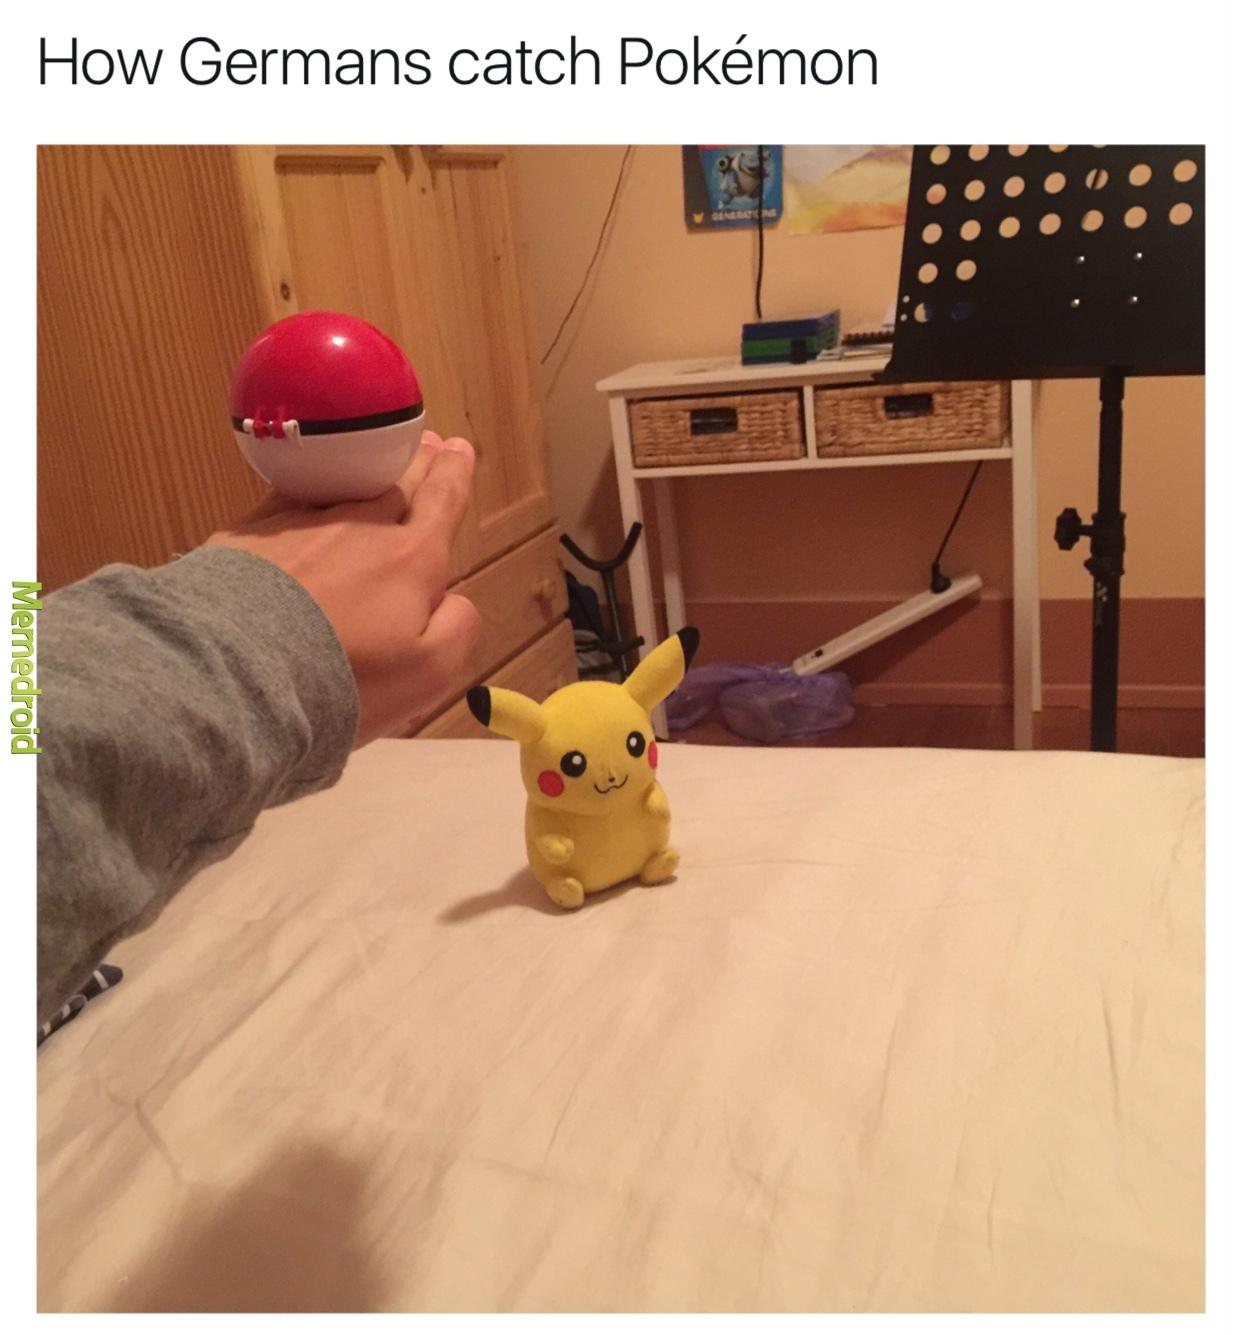 don't judge my room - meme